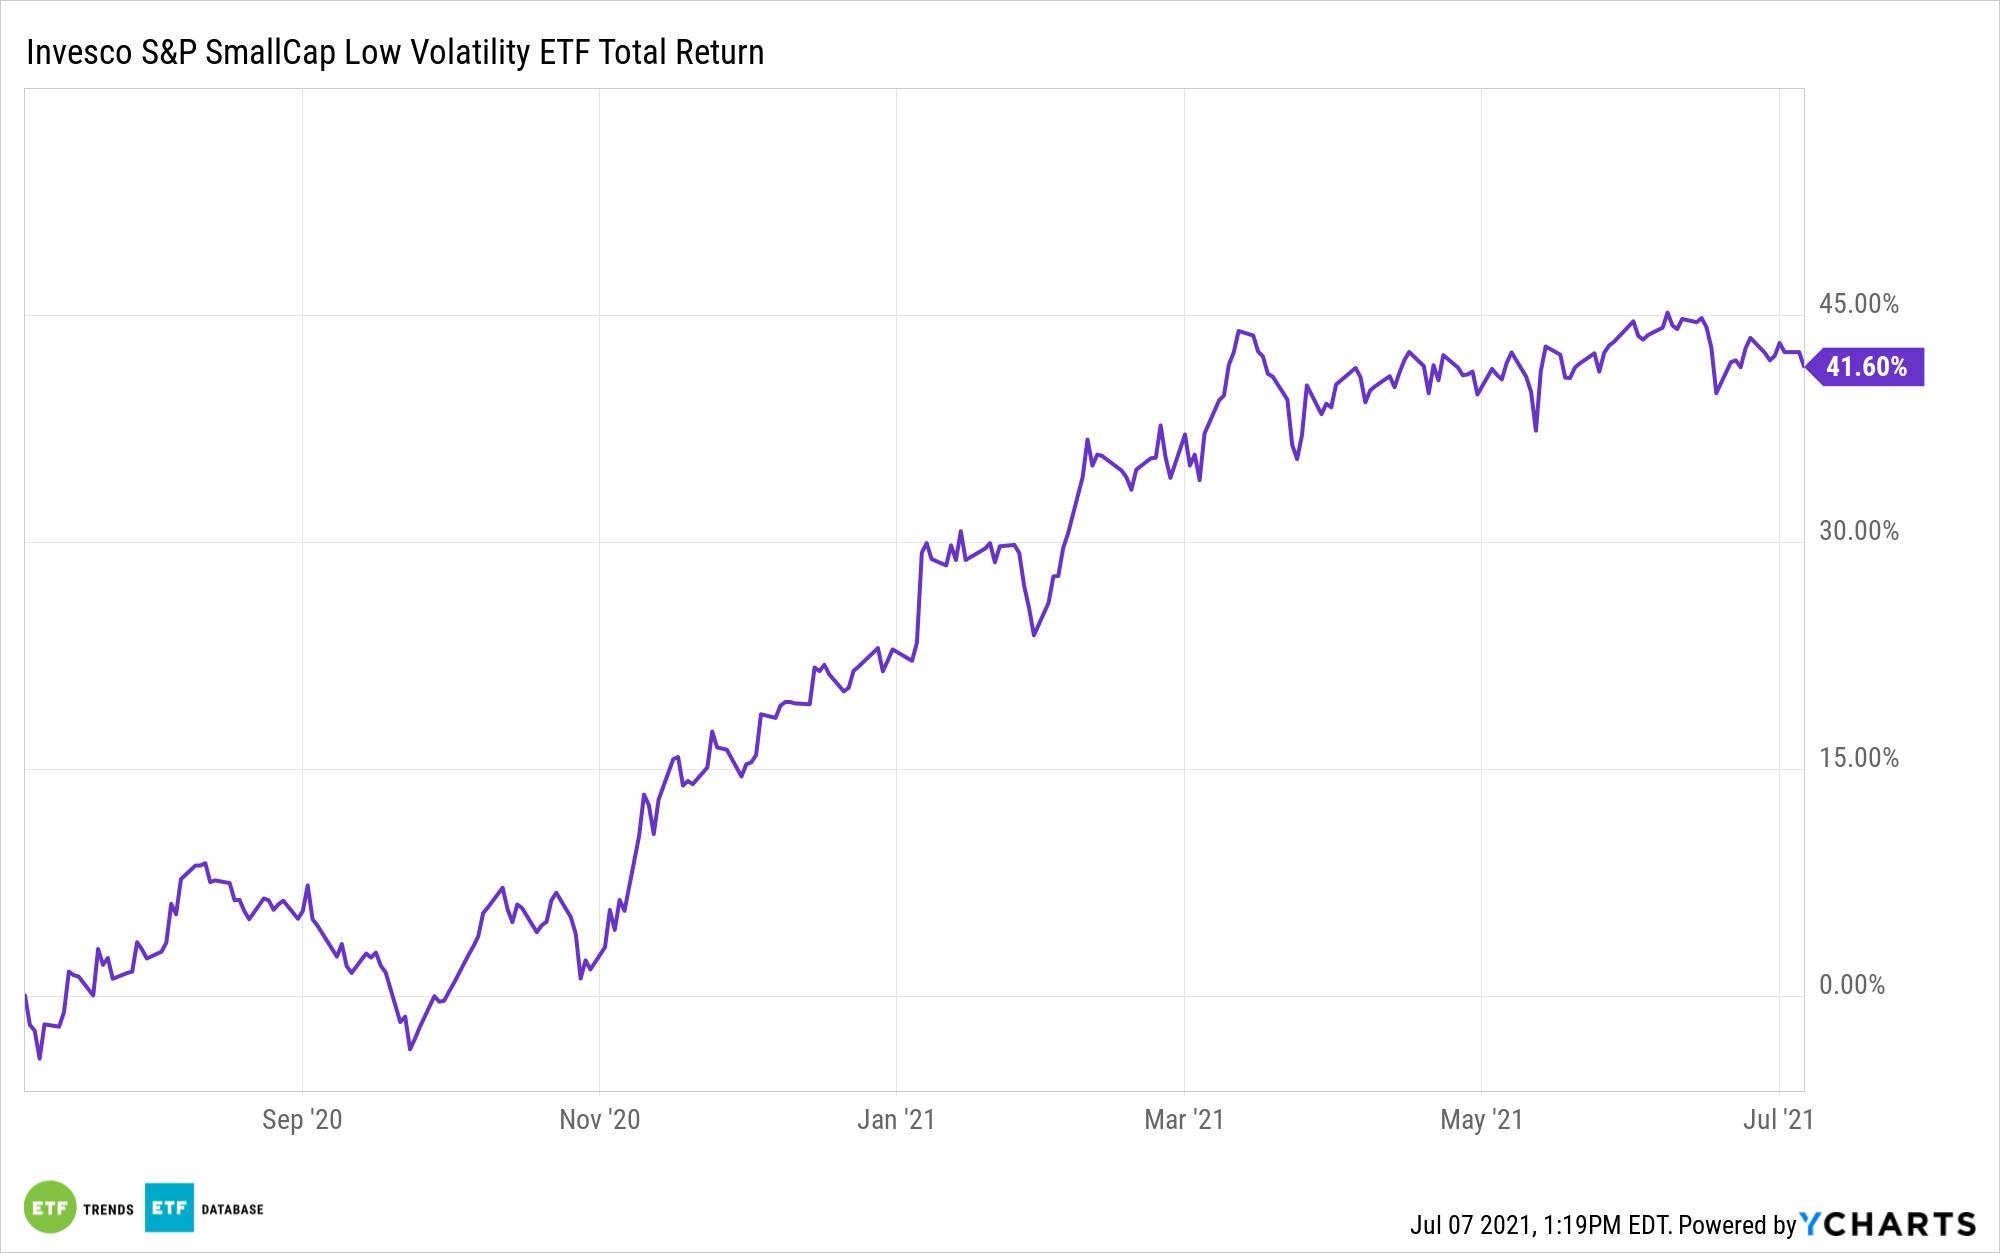 XSLV 1 Year Performance